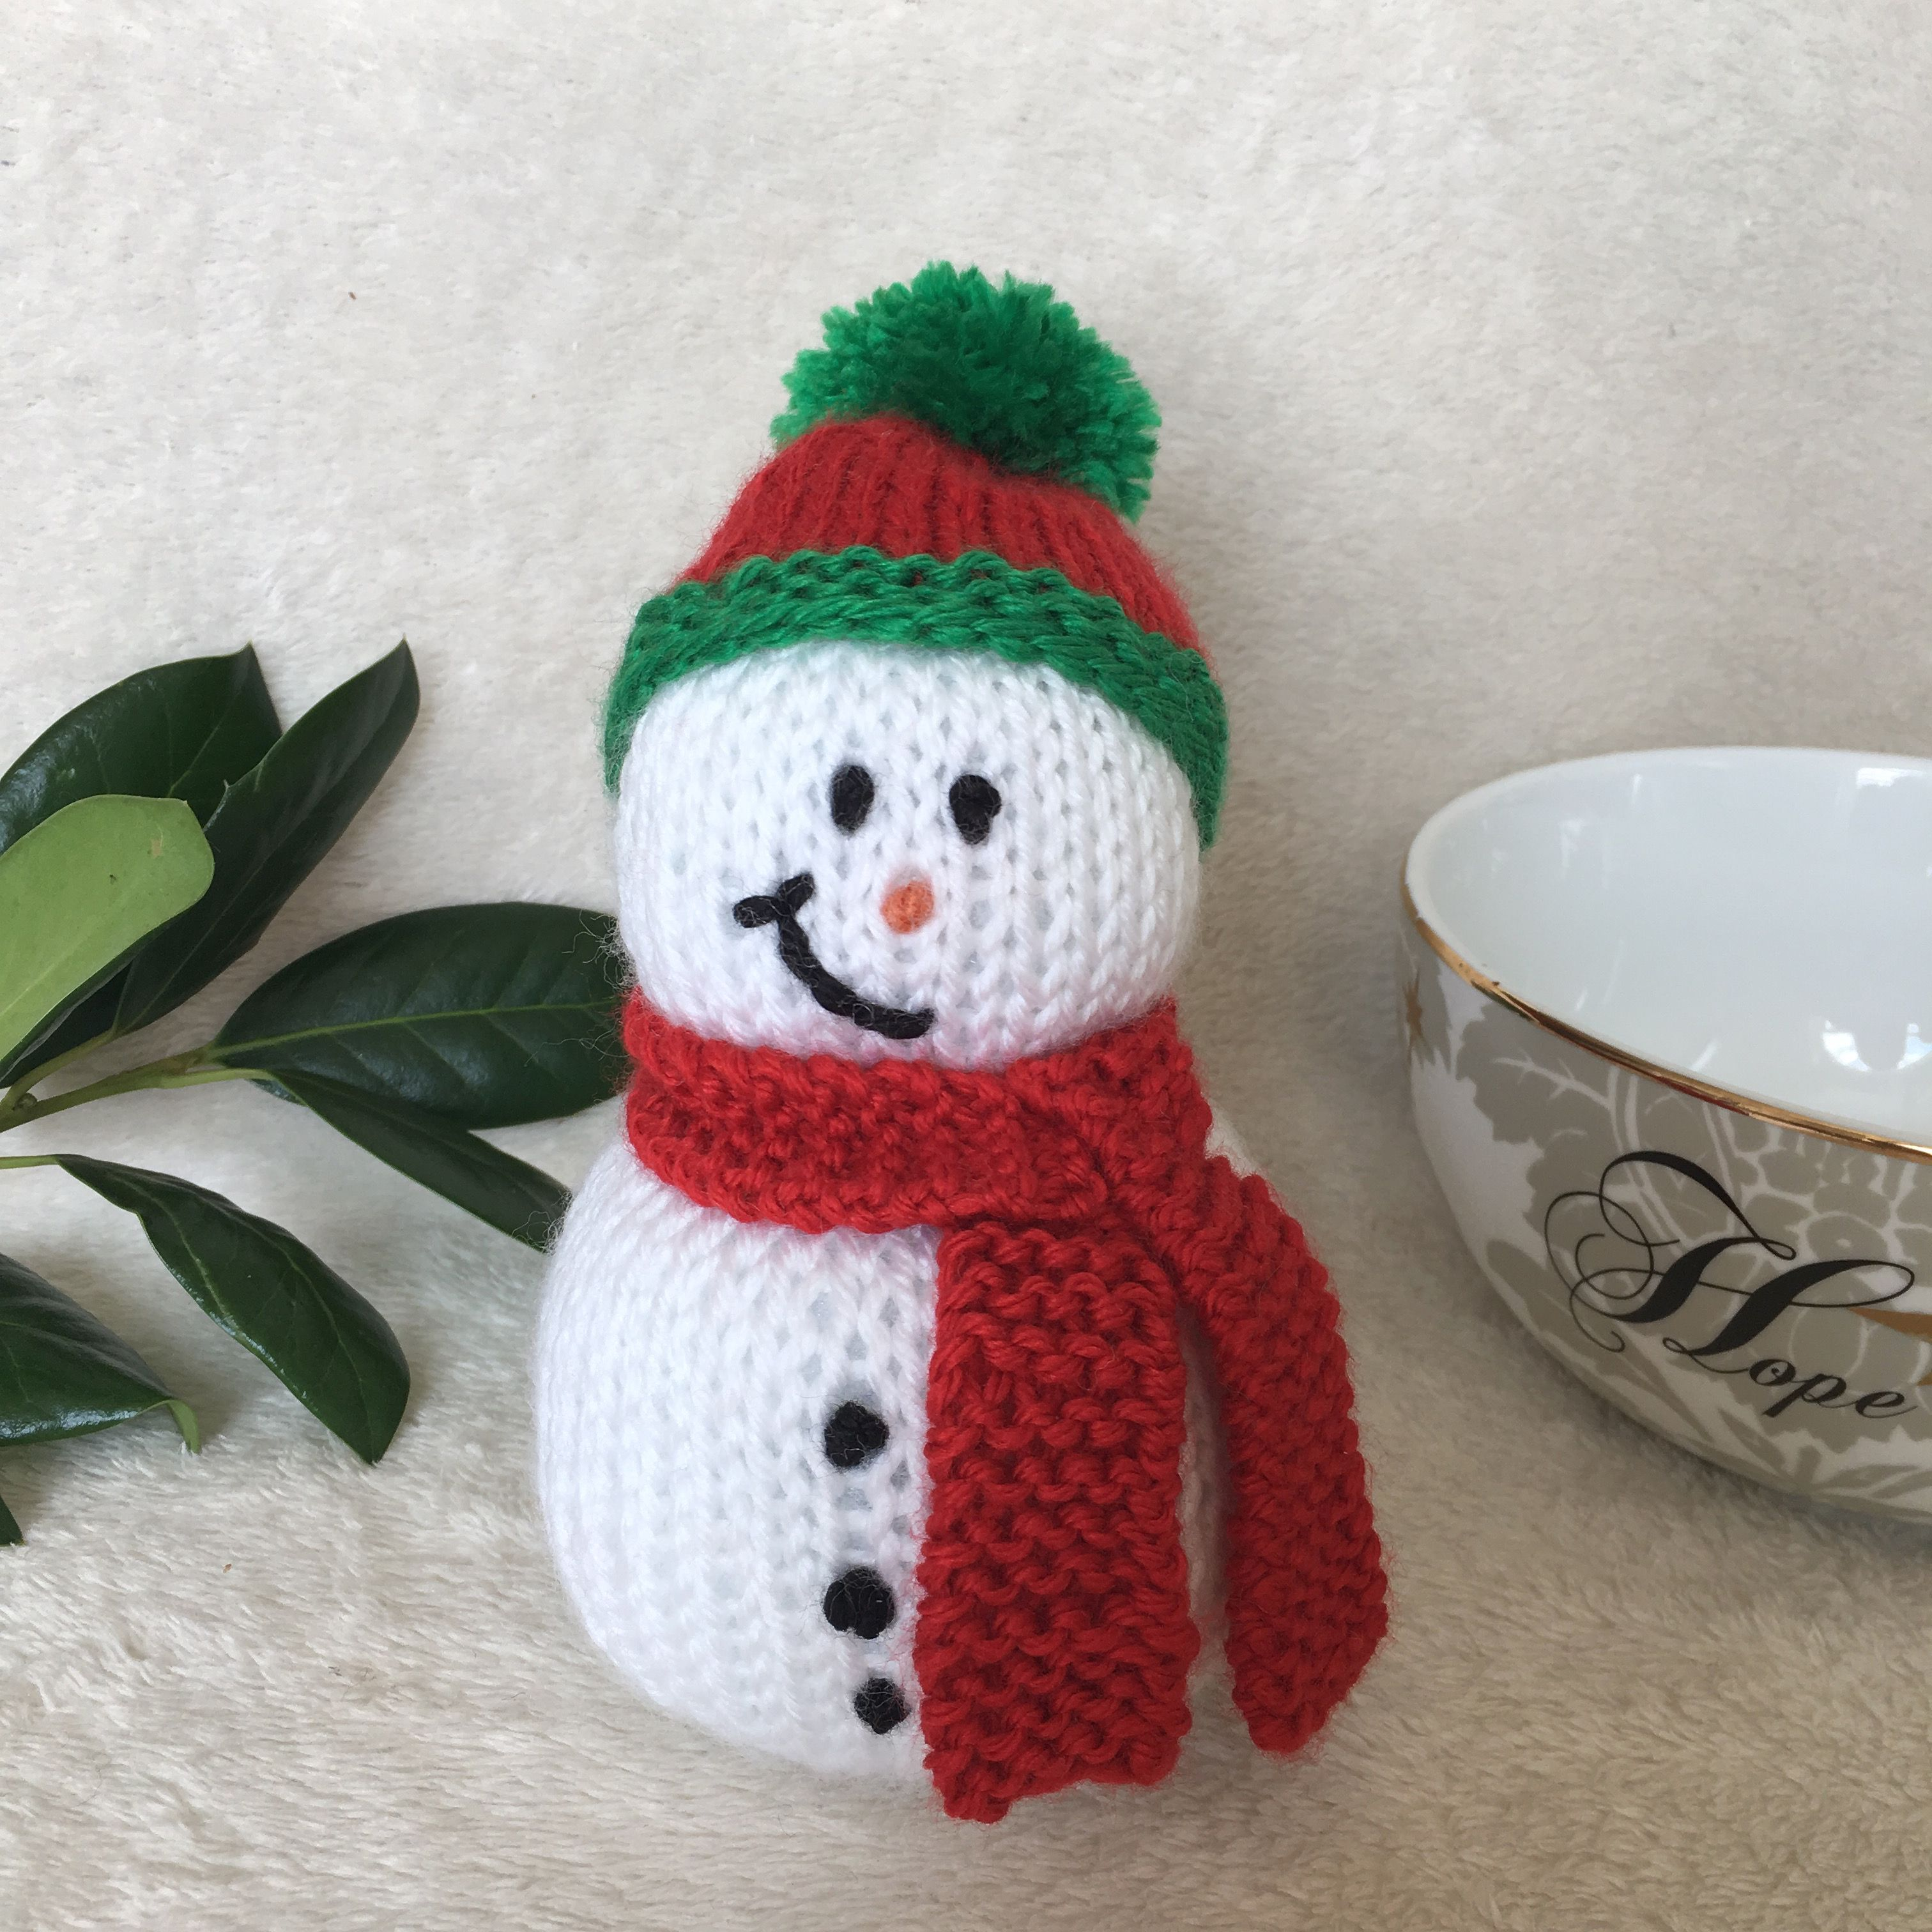 Jules Knitwear design # christmasinjuly #christmasinnewyork #christmasinteriors #christmasideas #christmascrafts #christmasart #christmasfeeling #christmasvibes #hatandscarfweather #hatandscarfseason #snowman #snowmandecor #snowmanart #snowmania #snowmancraft #snowmanhat #snowmancollection #snowmanseason #snowmanmaker #mooresville #mooresvillenc #mooresvillestrong #mooresvillemoms #mooresvillerealtor #mooresvillerealtor #mooresville_nc #mooresvilleshopping #knitsnowman #knittedsnowman